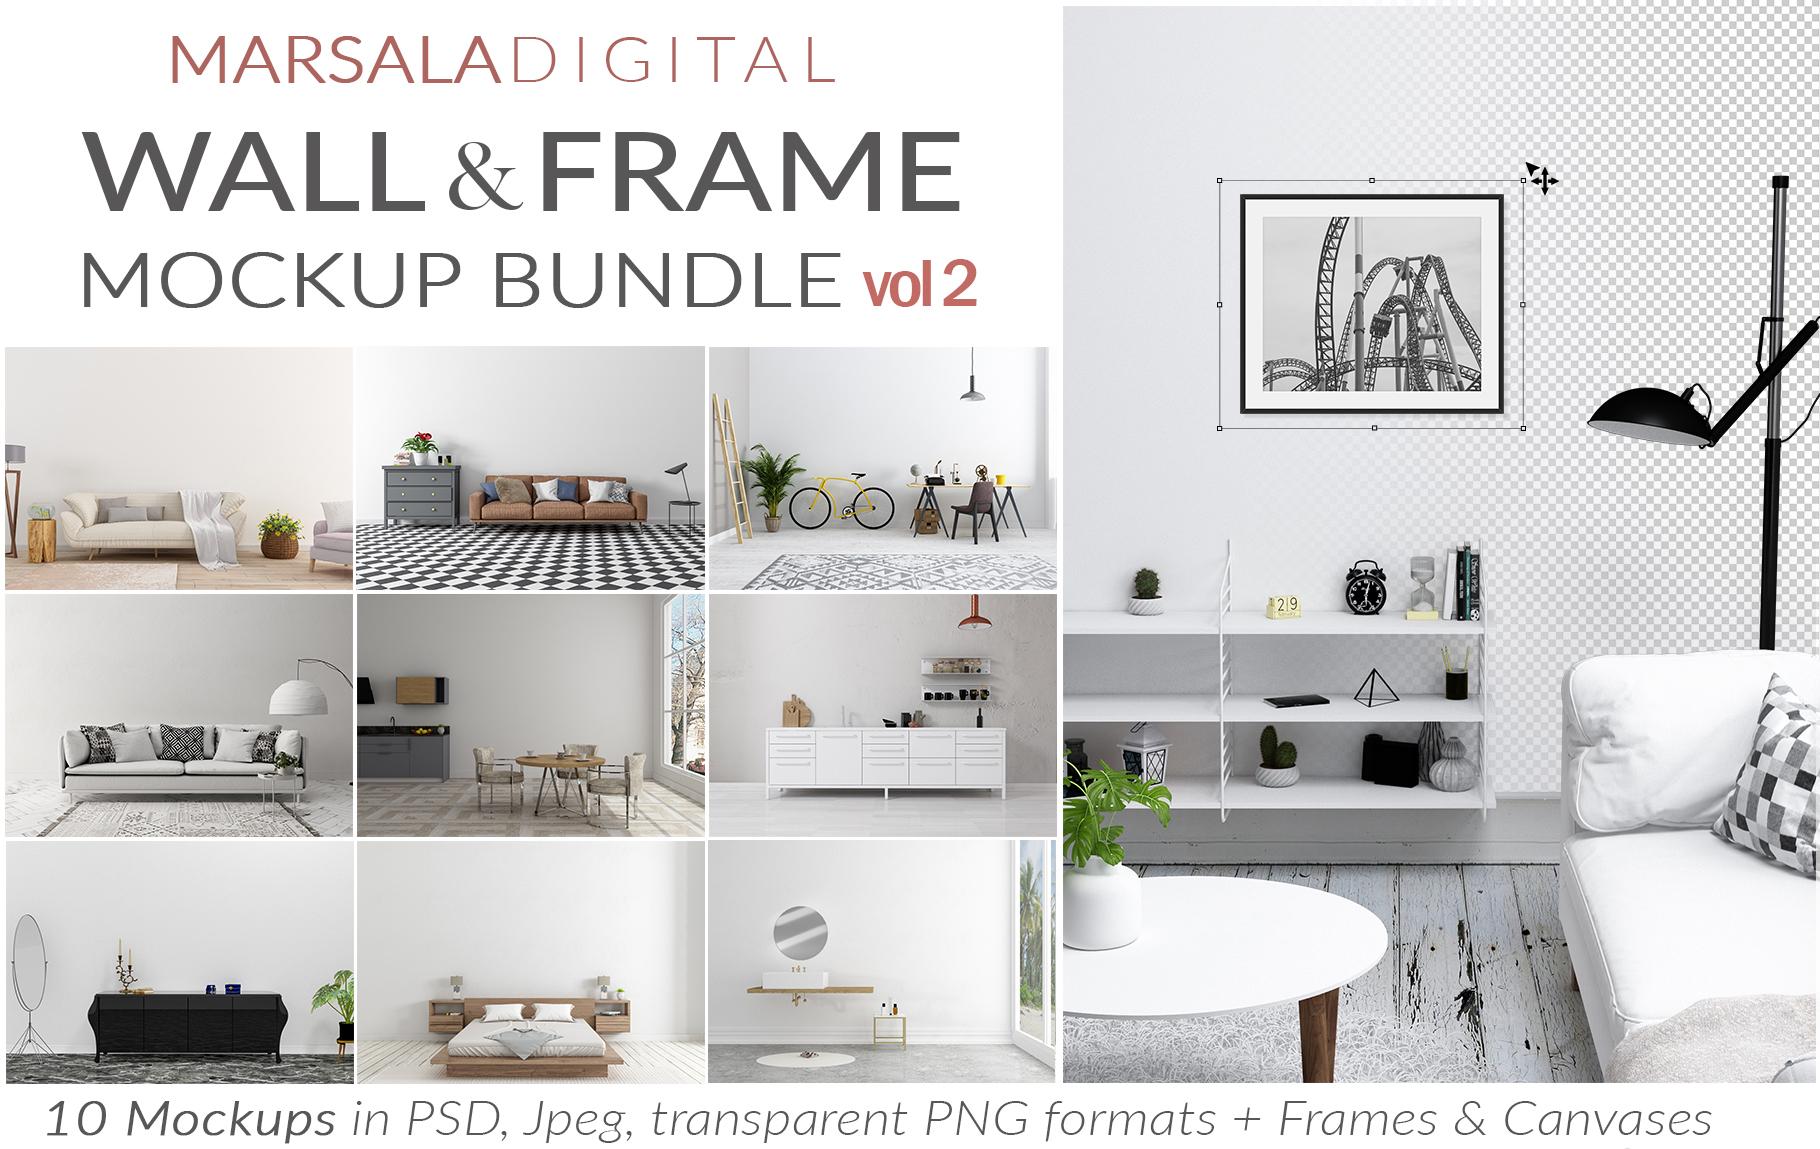 Massive Interior Wall Mockup, Frame Mockup Bundle FREE sampl example image 6